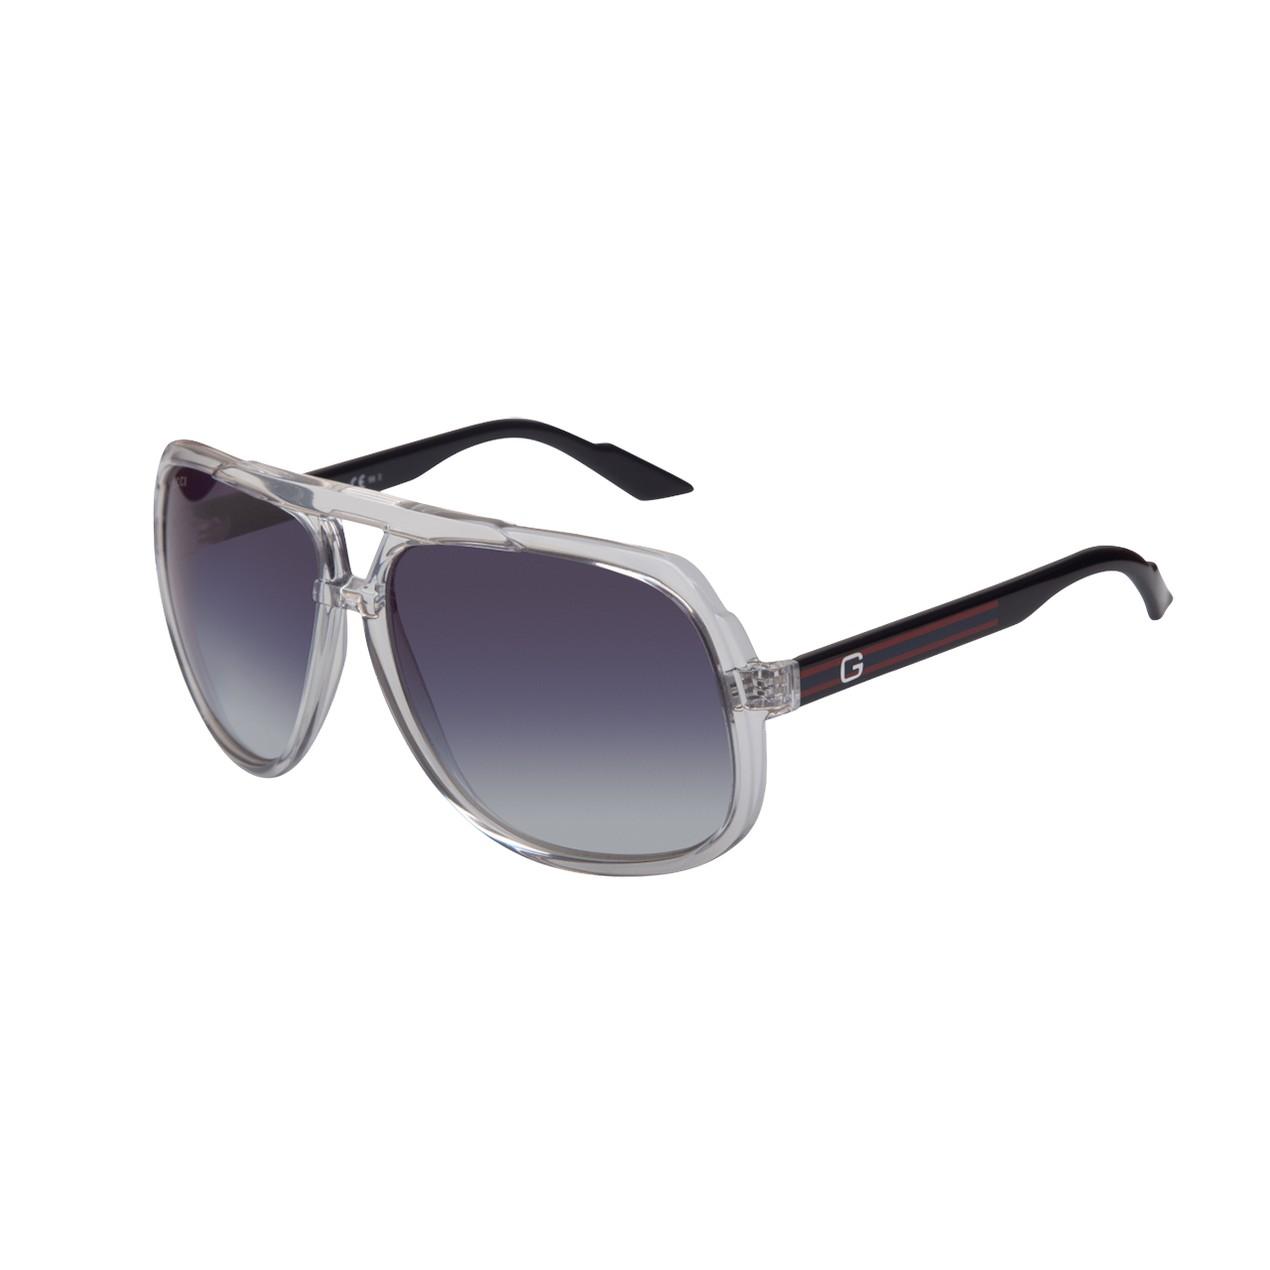 df0dd042ccb Gucci GG 1622 S U75 08 Sunglasses - Tanga